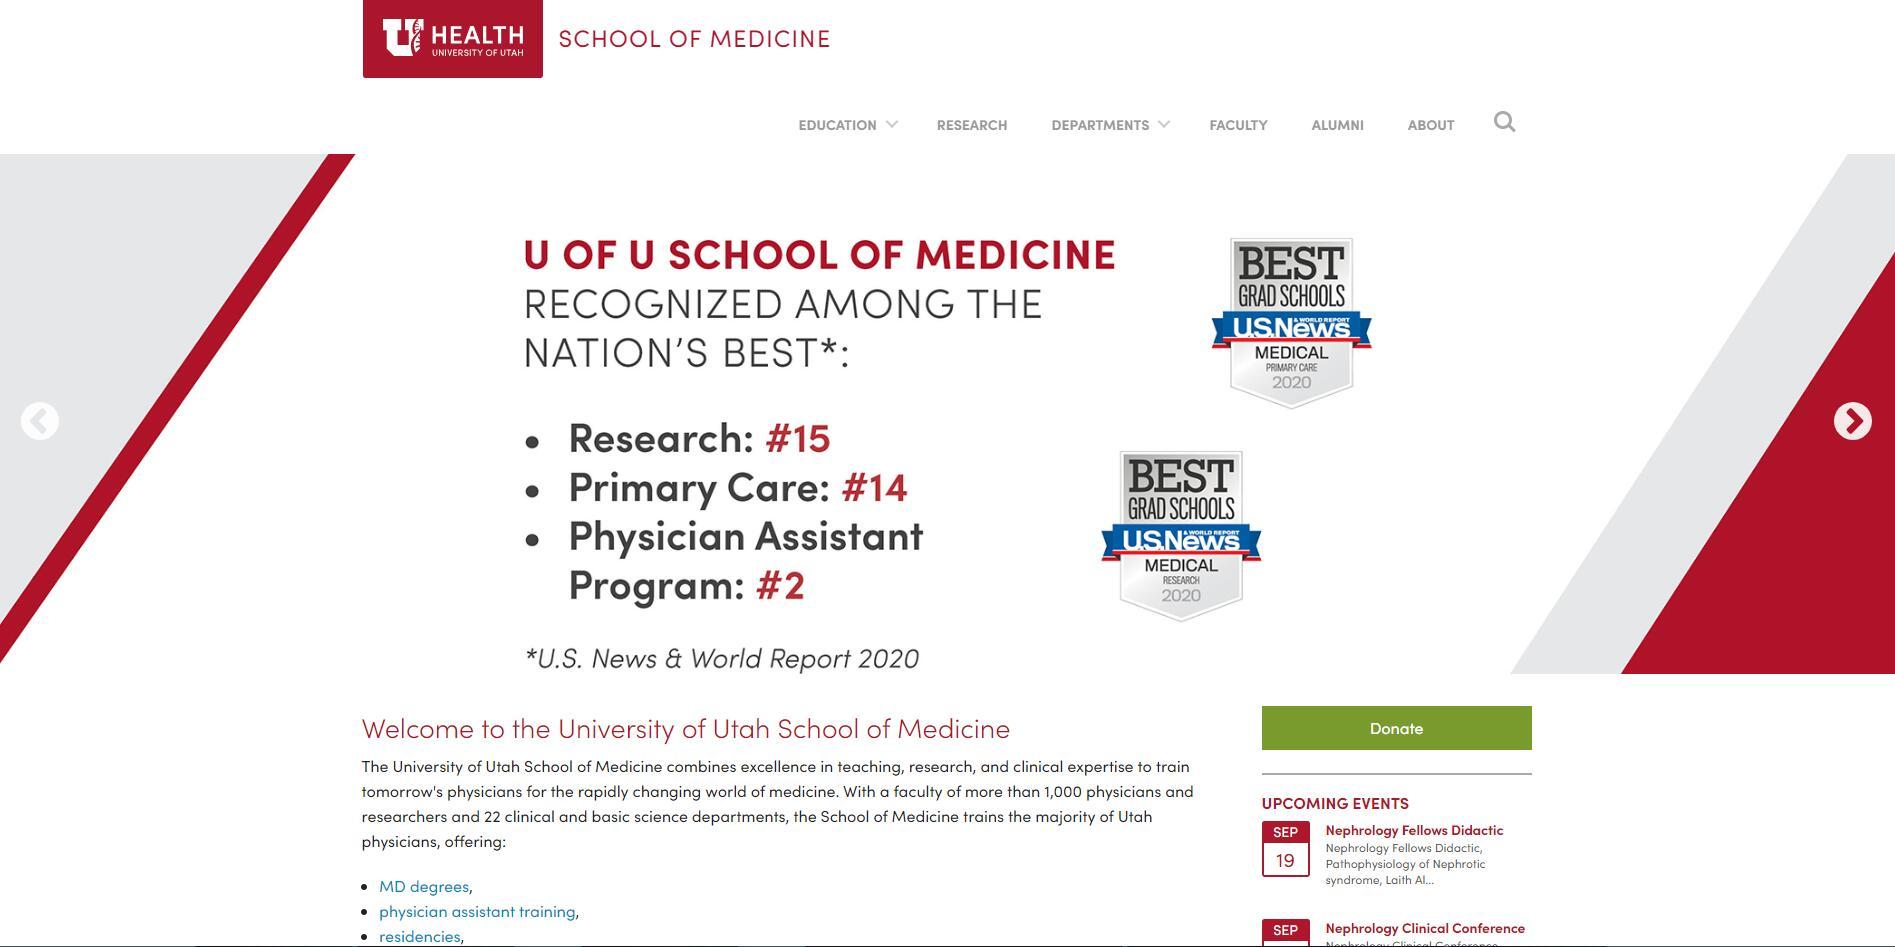 The School of Medicine at University of Utah